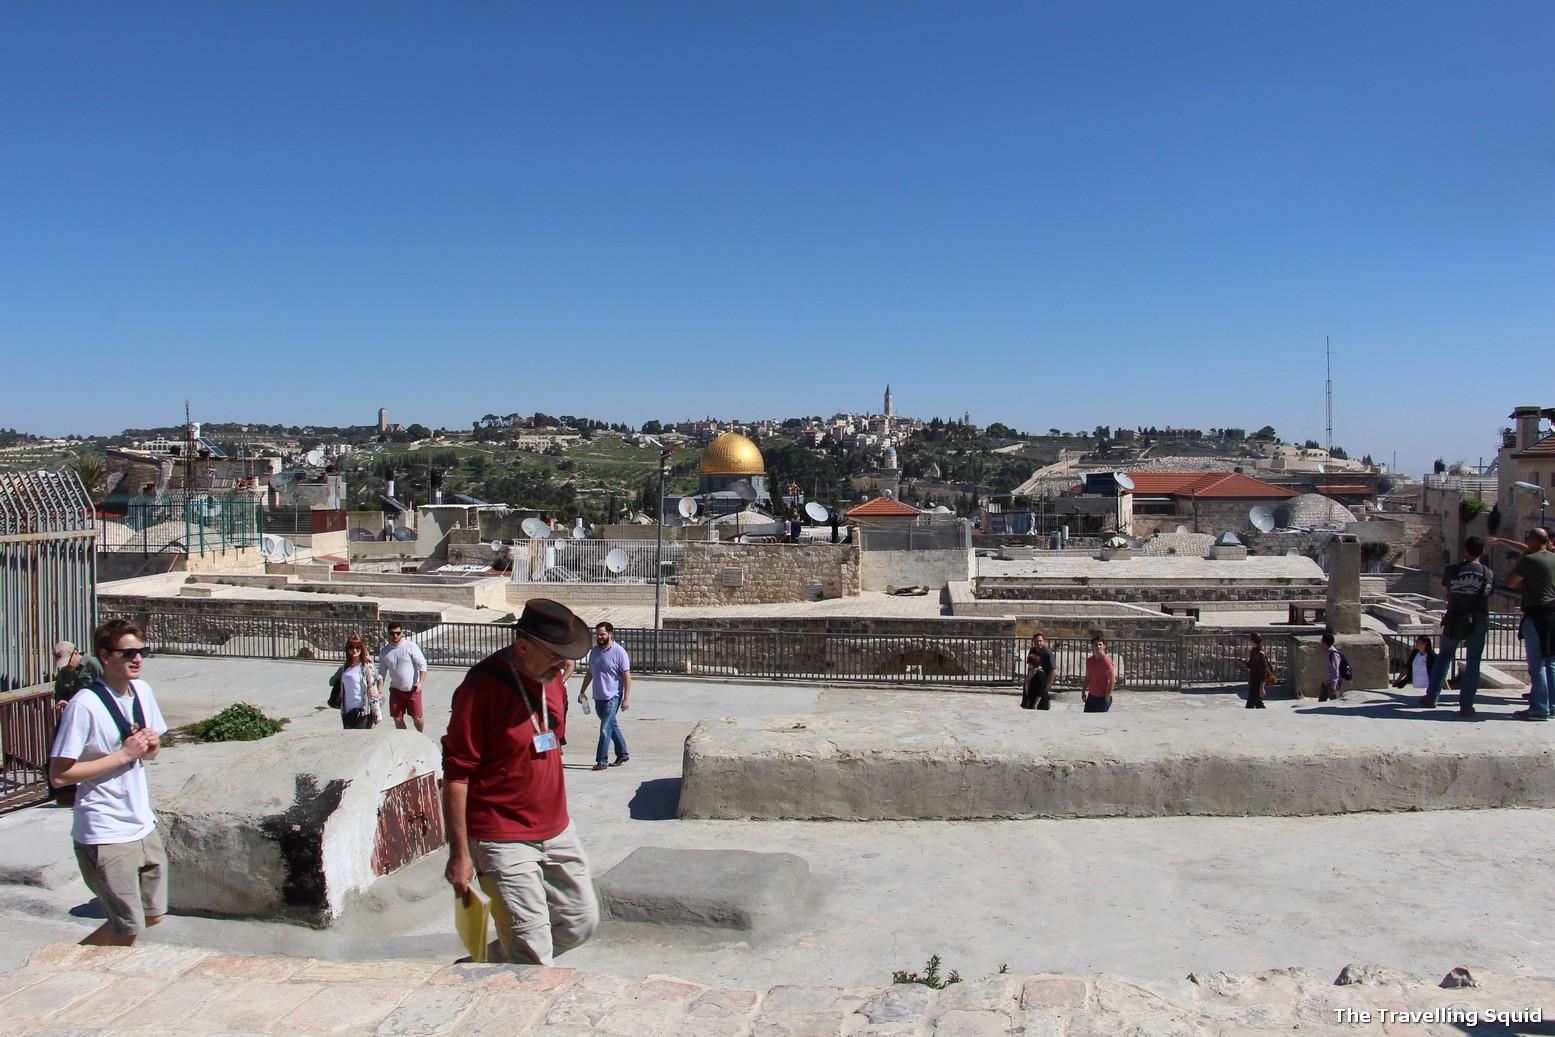 Temple Mount in Jerusalem as a tourist